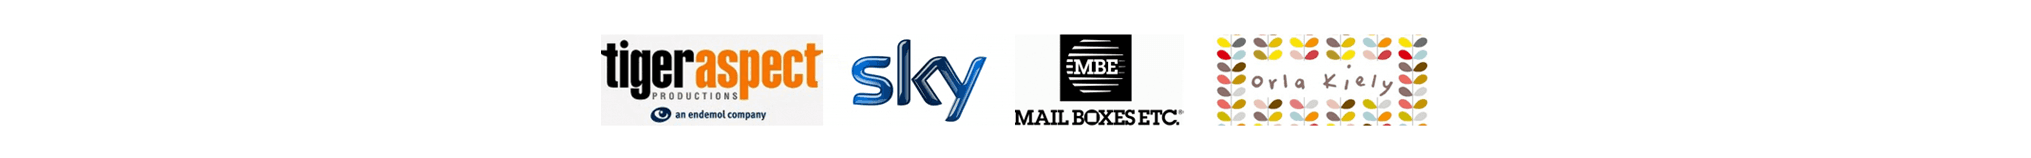 sky tigeraspect logos